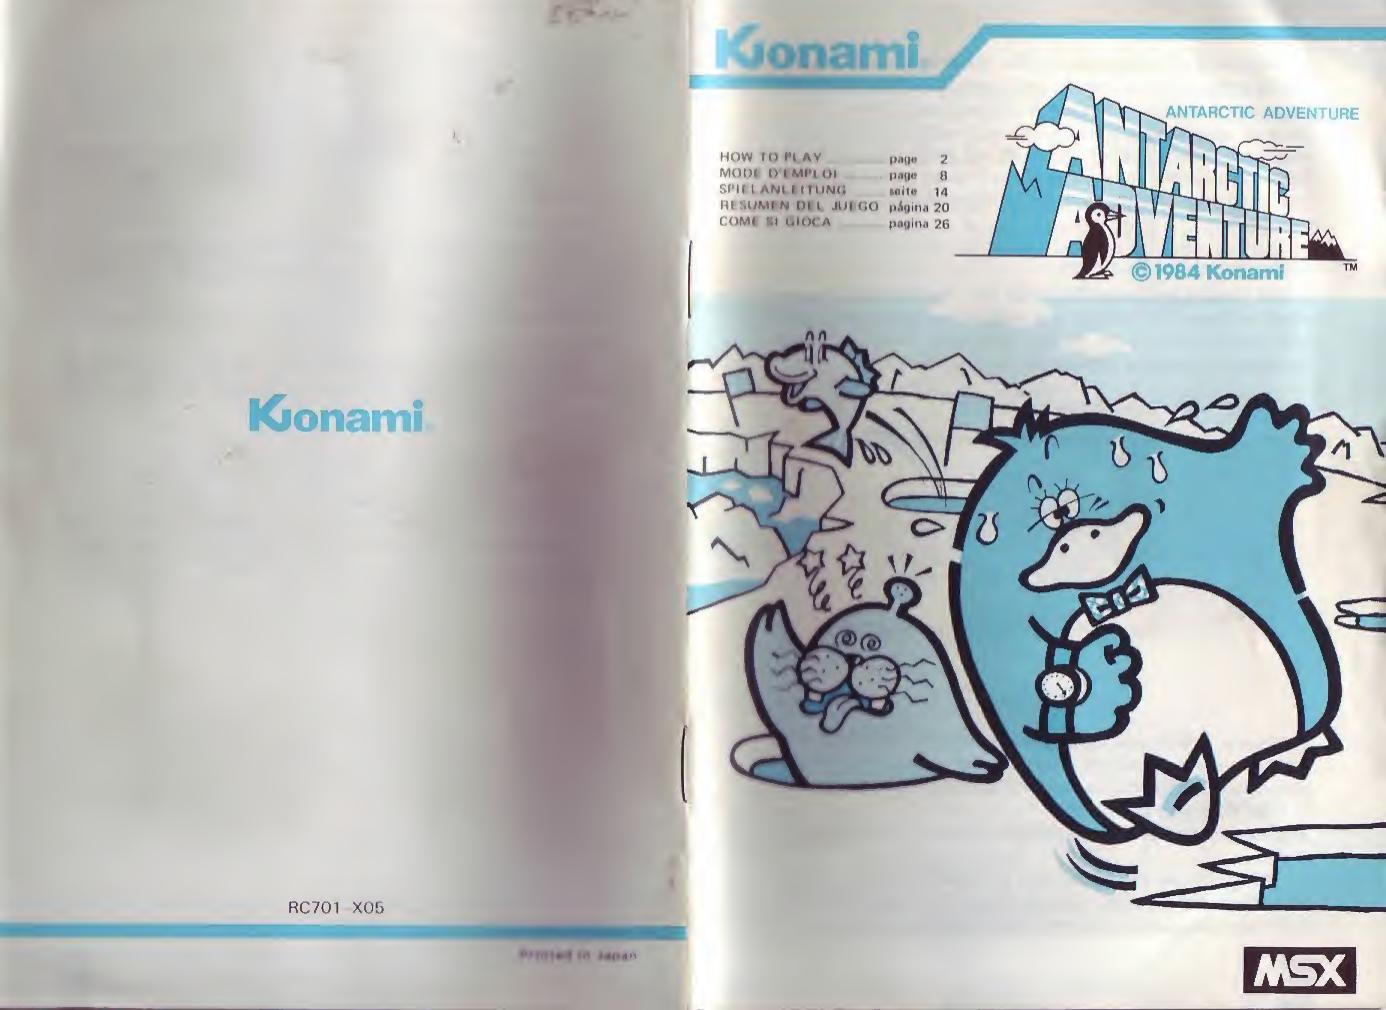 Antarctic Adventure Manual Gb Fr Antartic Text